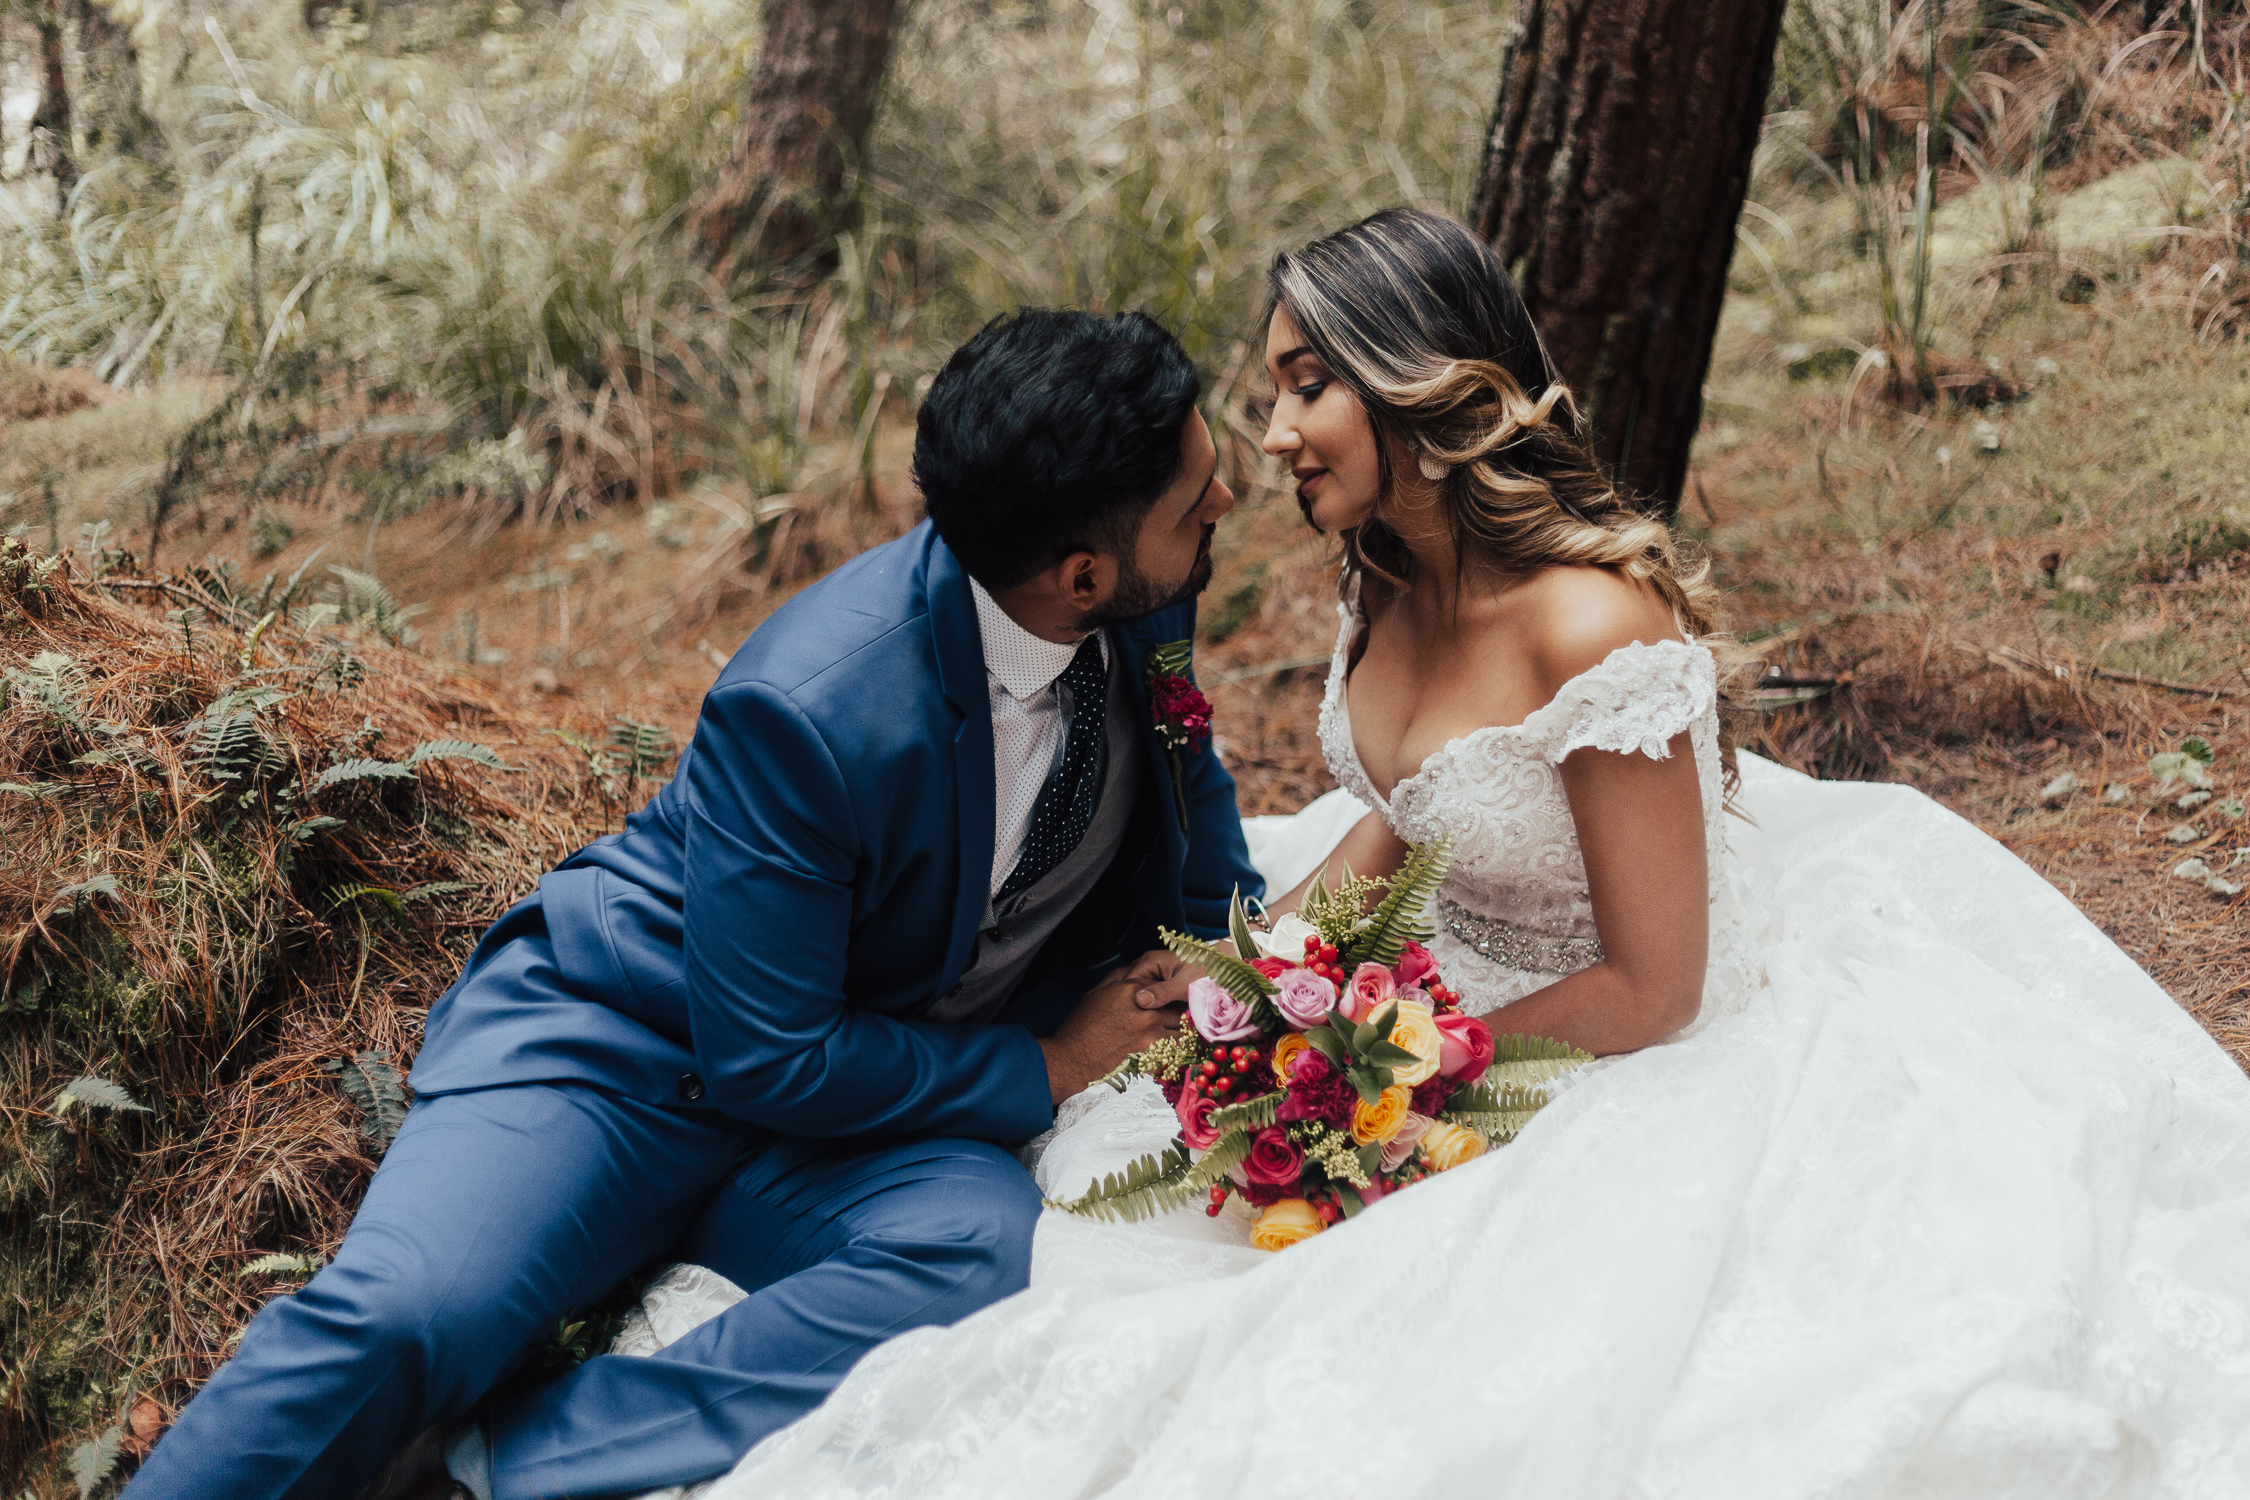 Michelle-Agurto-Fotografia-Bodas-Destination-Wedding-Photographer-Ecuador-Sesion-Johanna-Eduardo-42.JPG